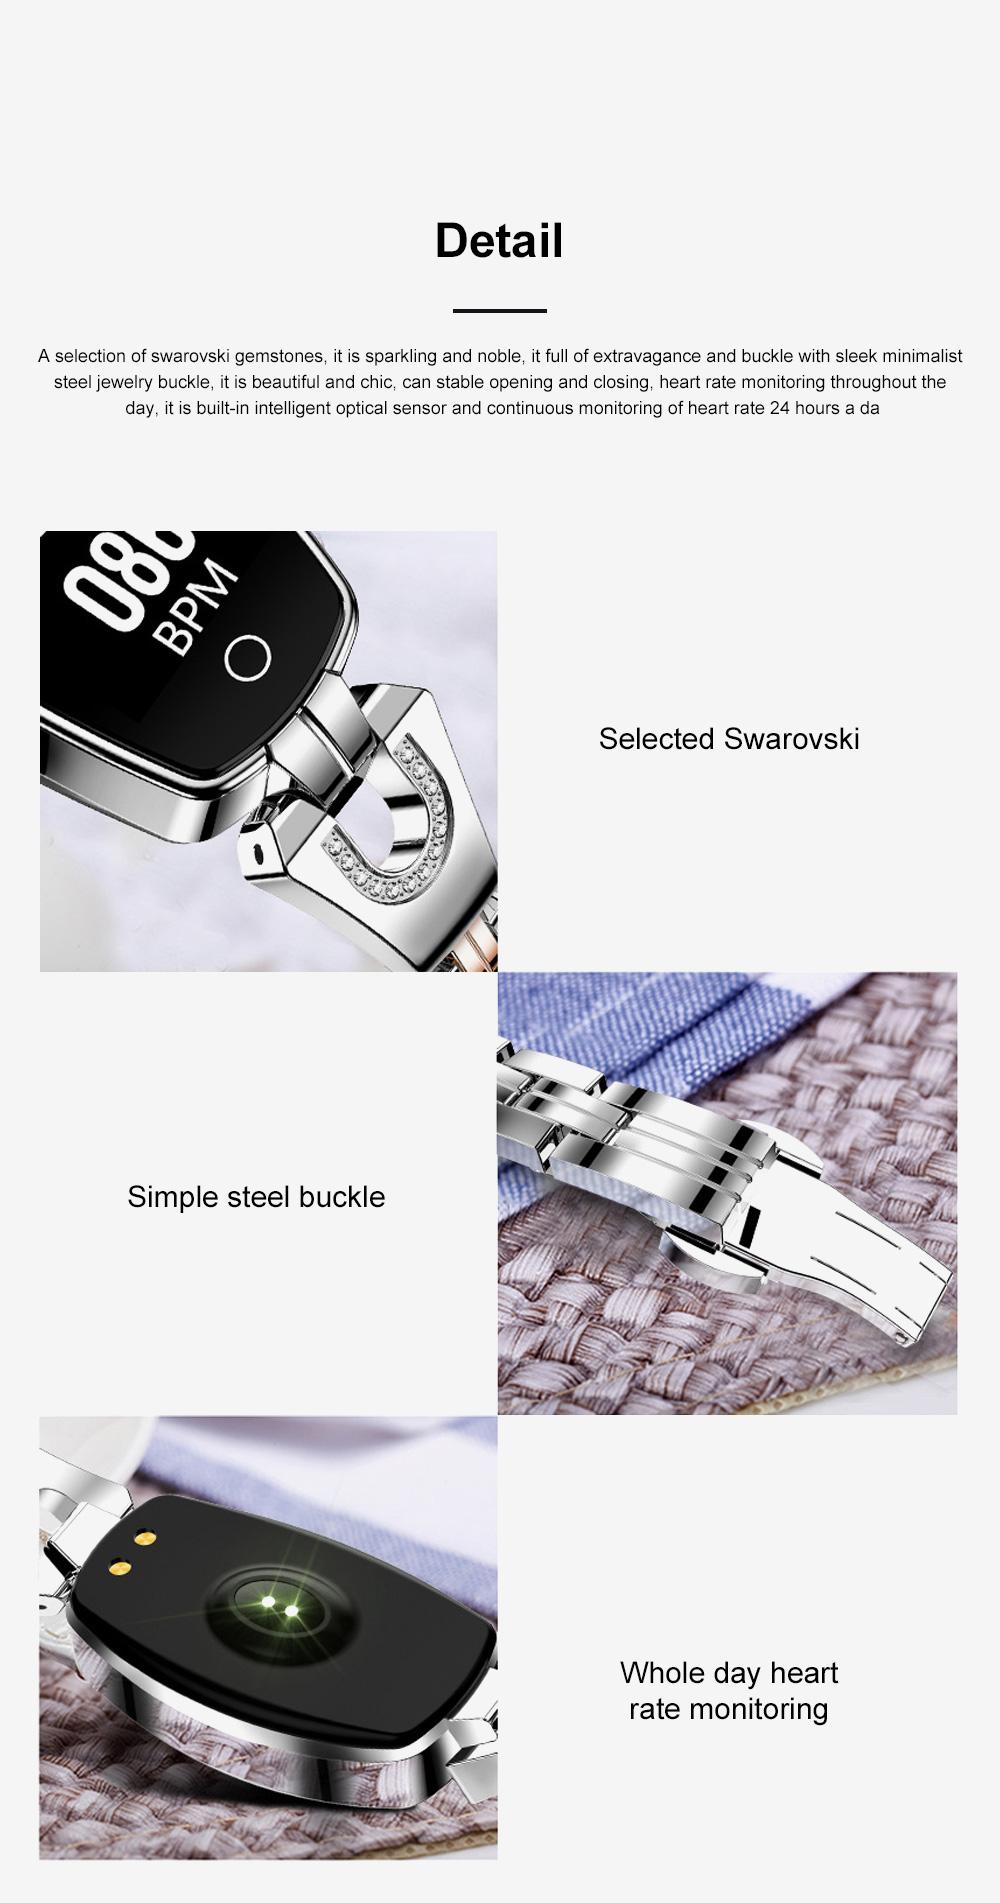 2019 Women Lady Fashion Smart Wristband H8 Heart Rate Blood Pressure Smart Bracelet Fitness Tracker Smart Watch Band Female Girl Gift 12